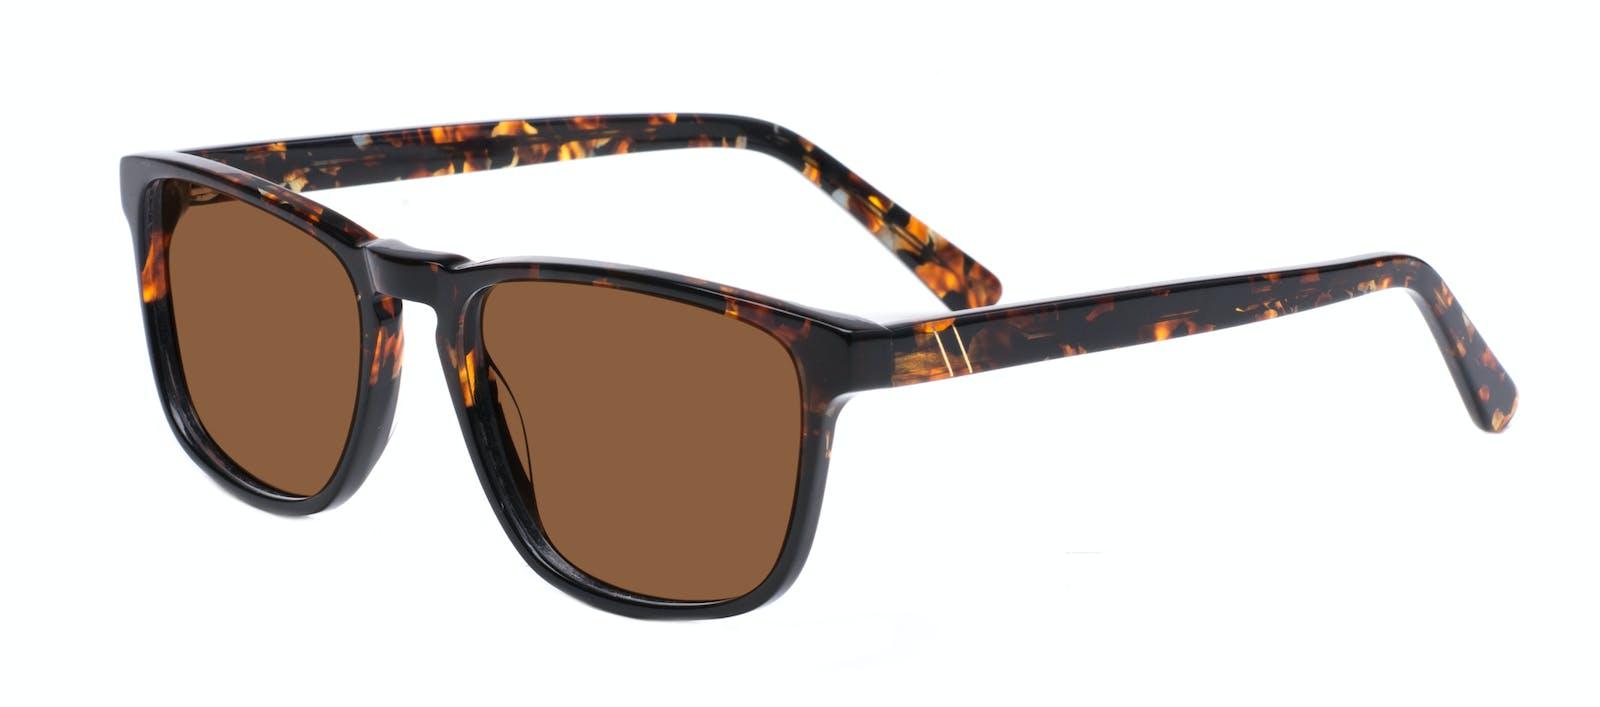 2892ecebb4f Affordable Fashion Glasses Rectangle Sunglasses Men Loft Mahogany Black Tilt